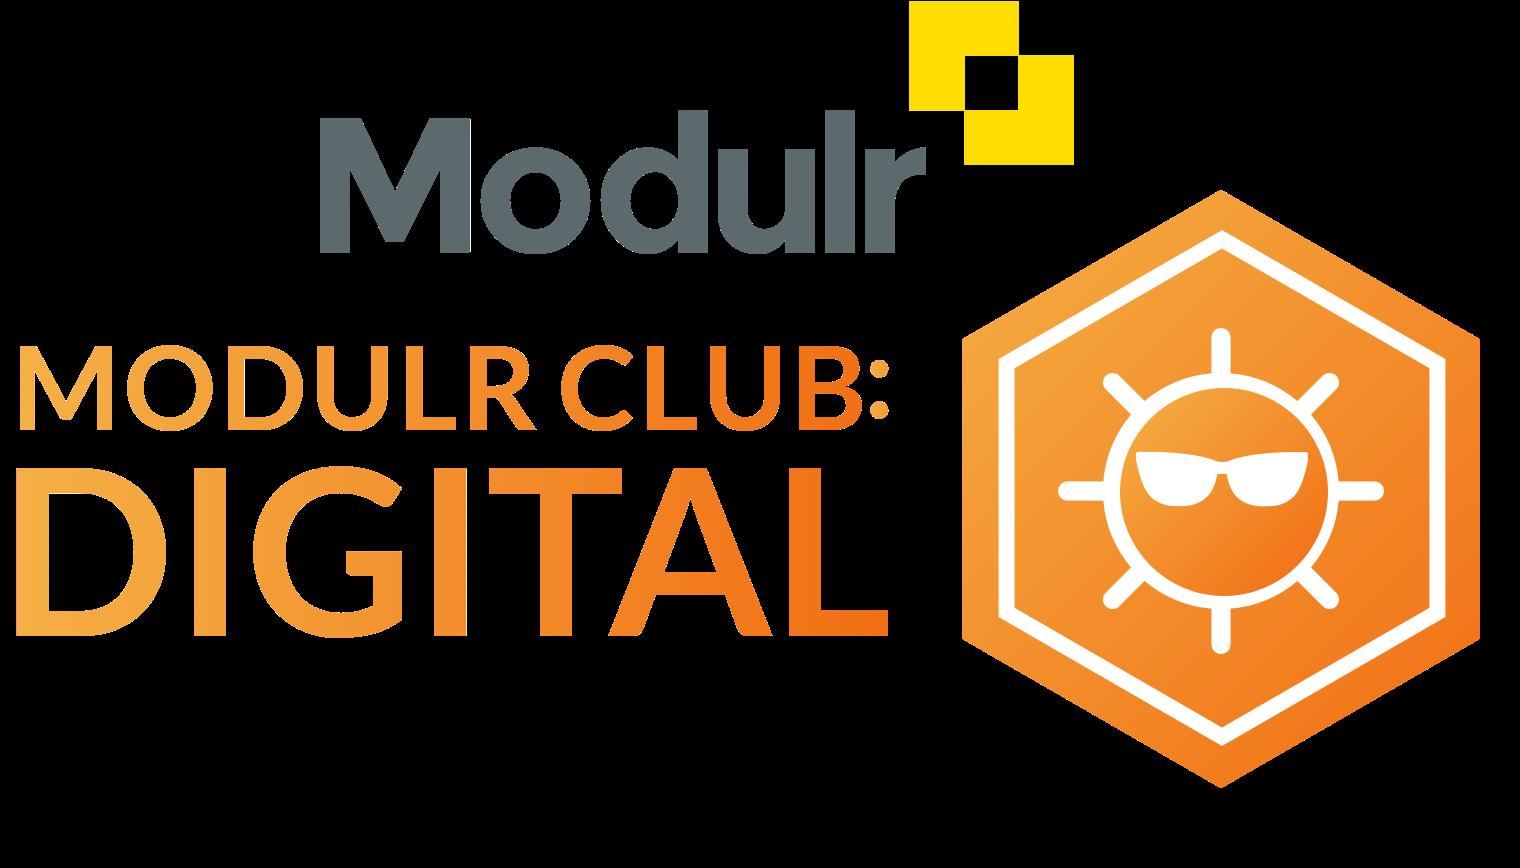 Modulr Club: Digital's Summer of Payments